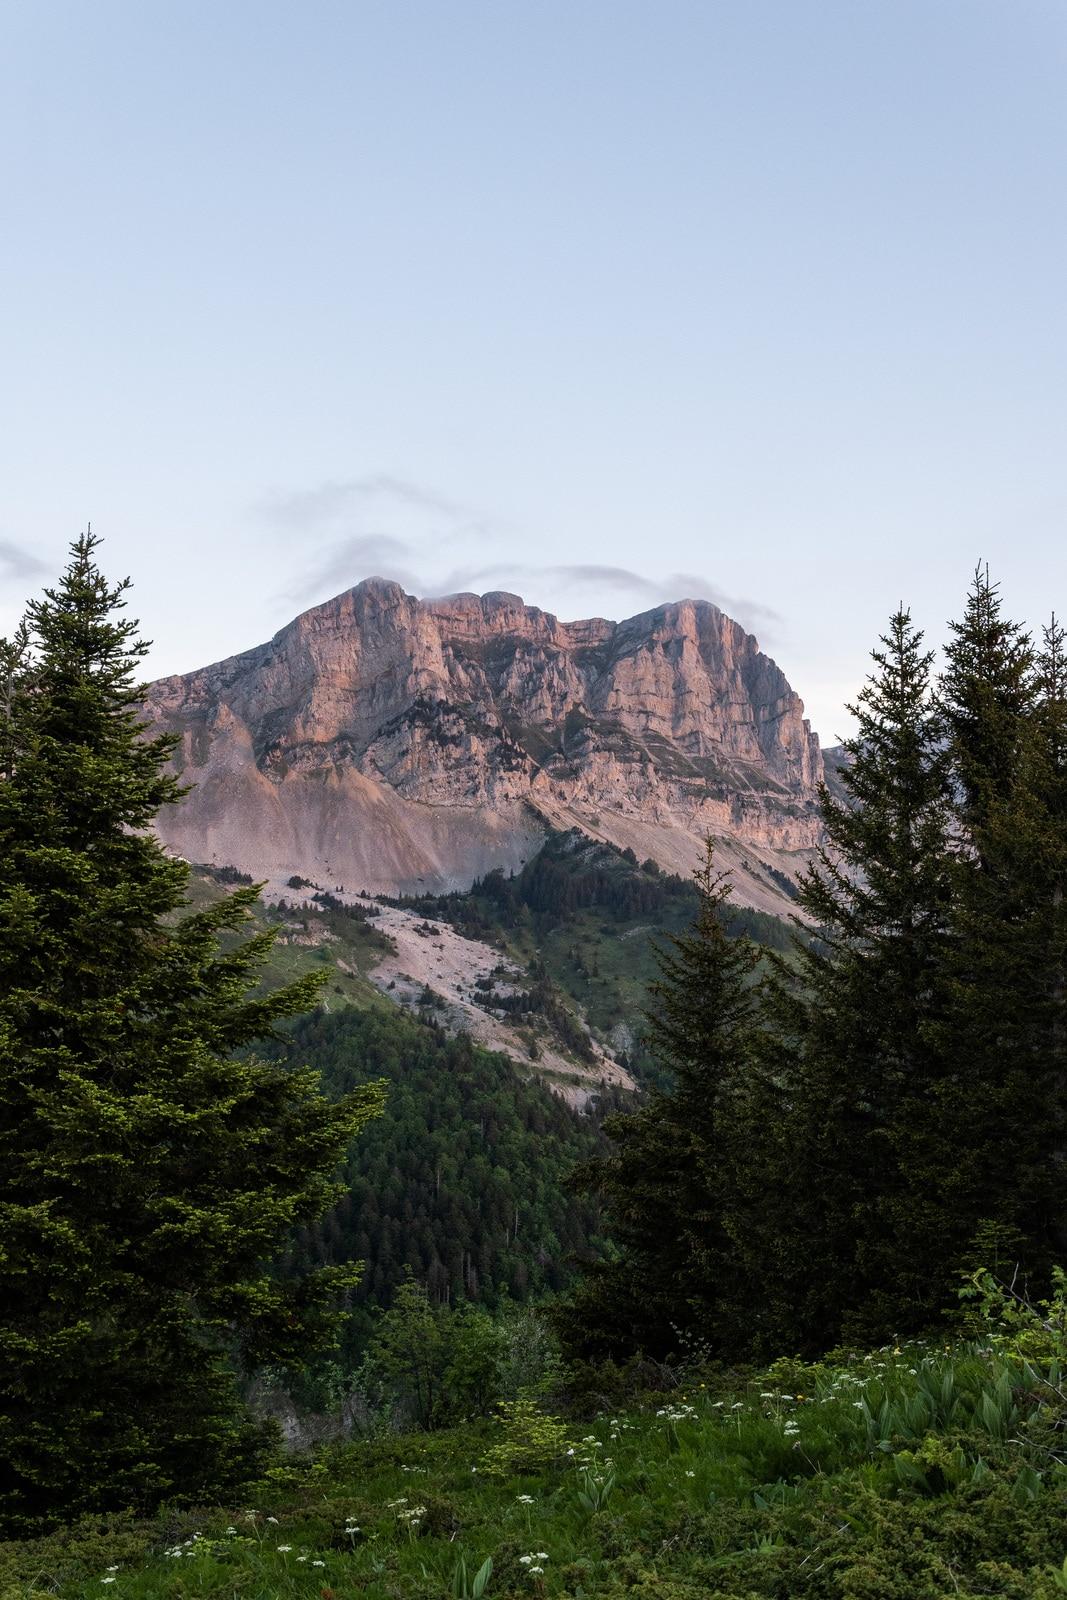 montagnes roses